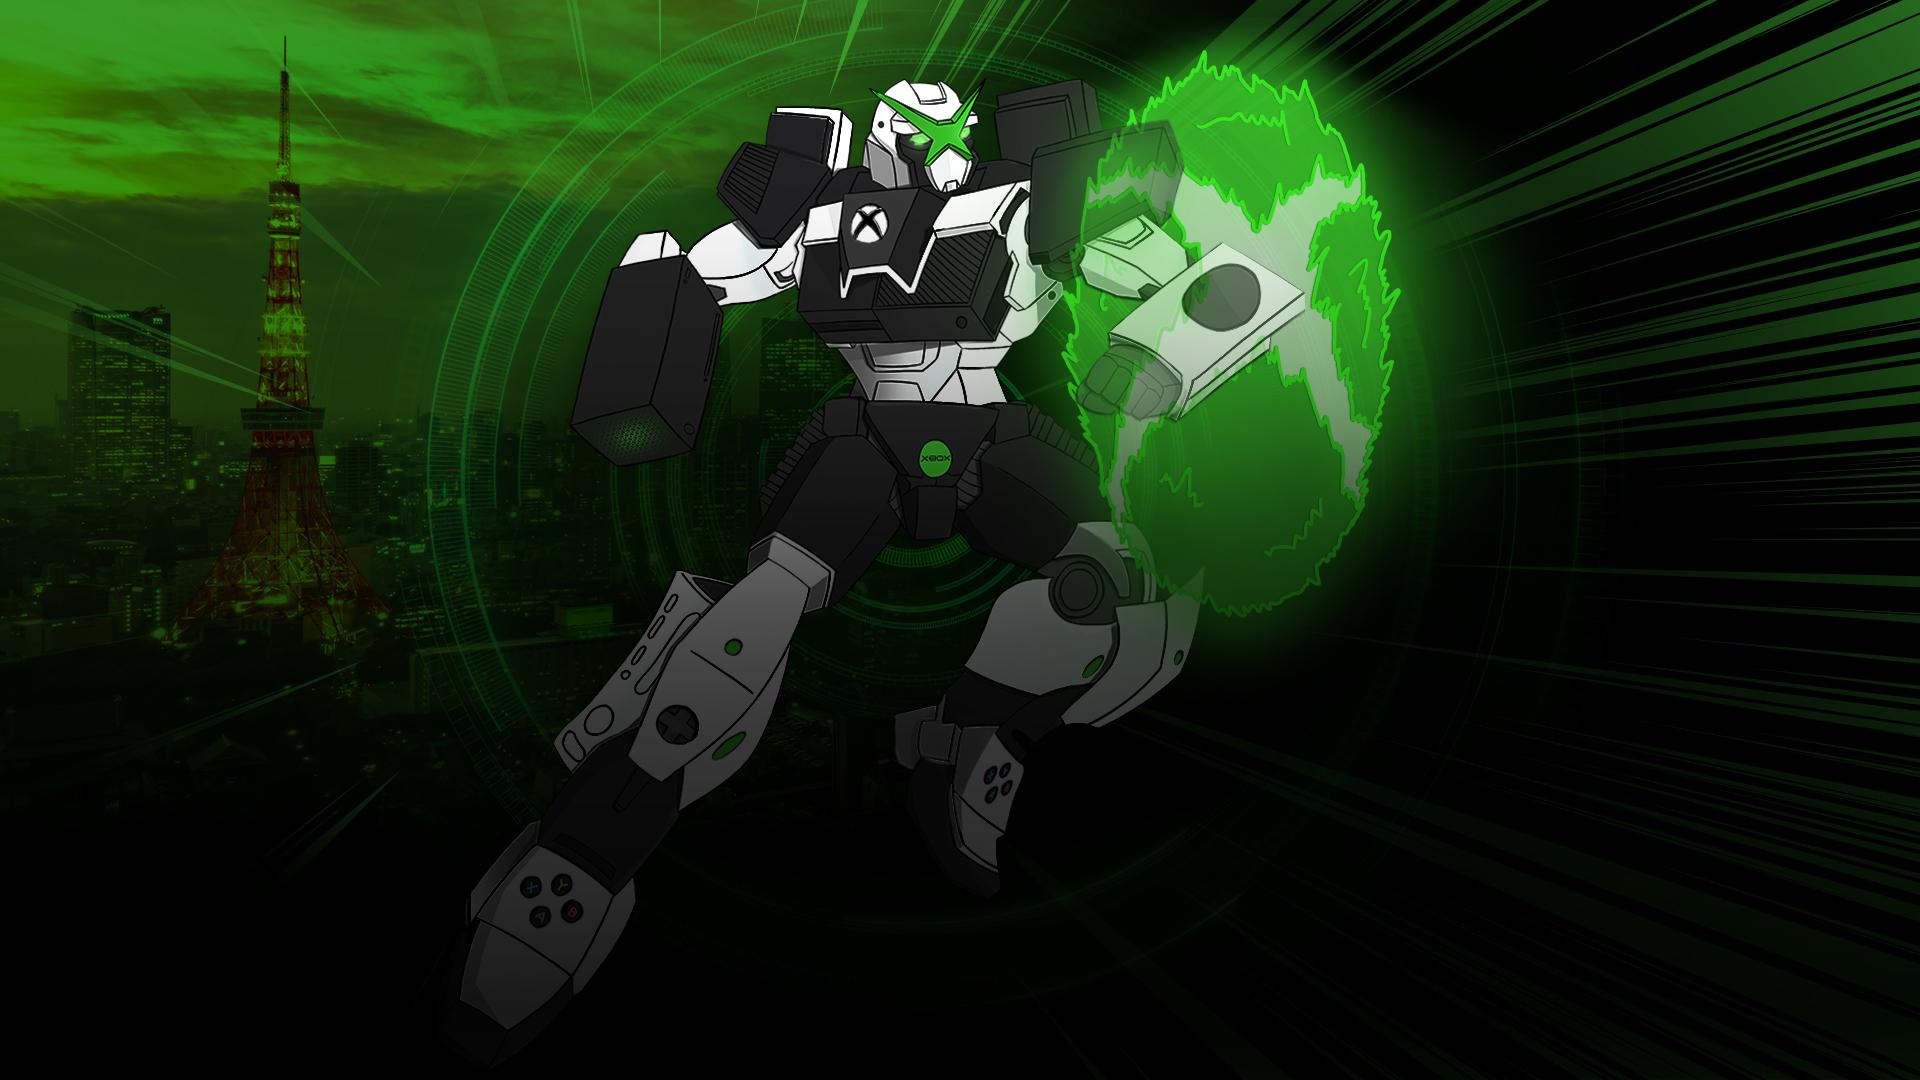 Xbox에서 영감을 받은 로봇, 오른팔용 Xbox Series X, 왼팔용 Xbox Series S 등